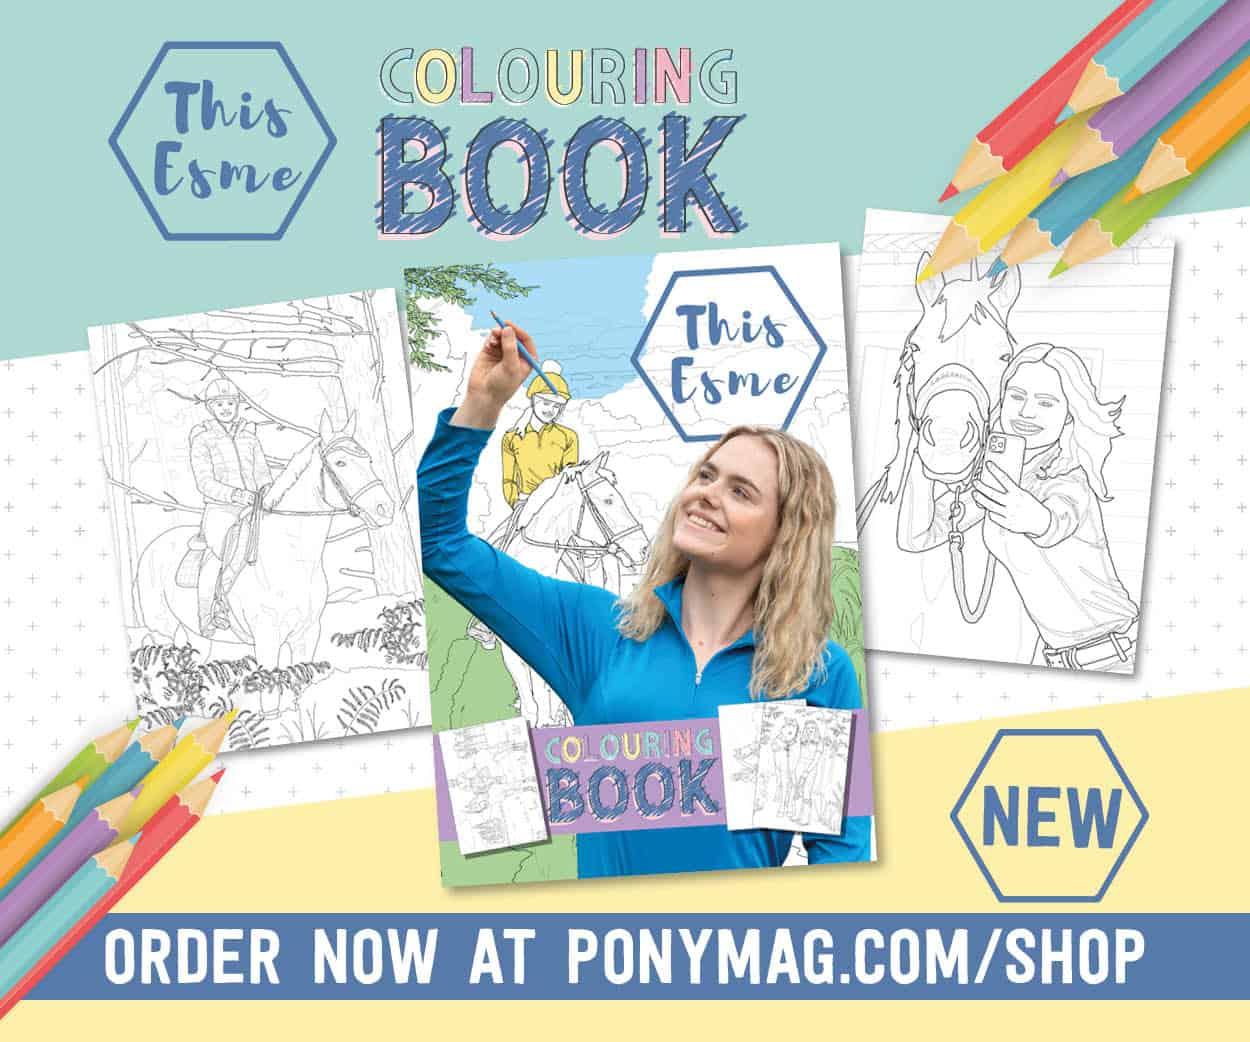 This Esme colouring book